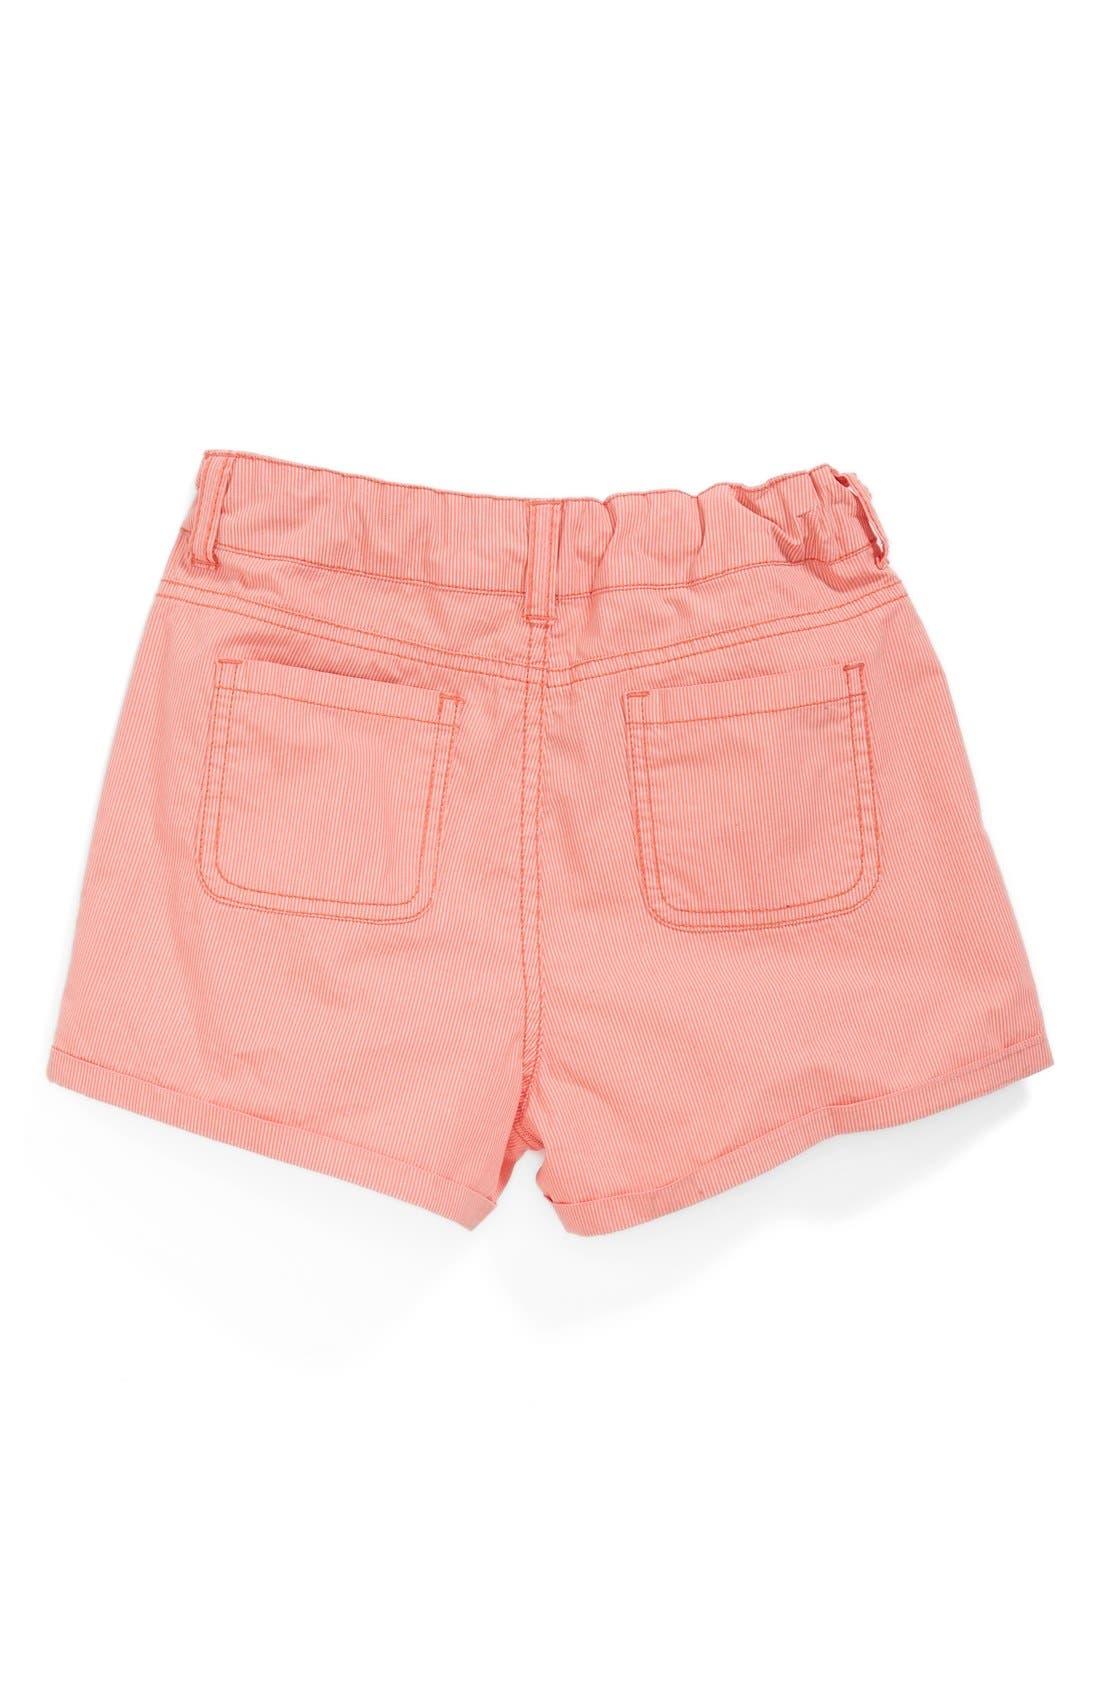 Alternate Image 2  - Tucker + Tate 'Mindy' Shorts (Big Girls)